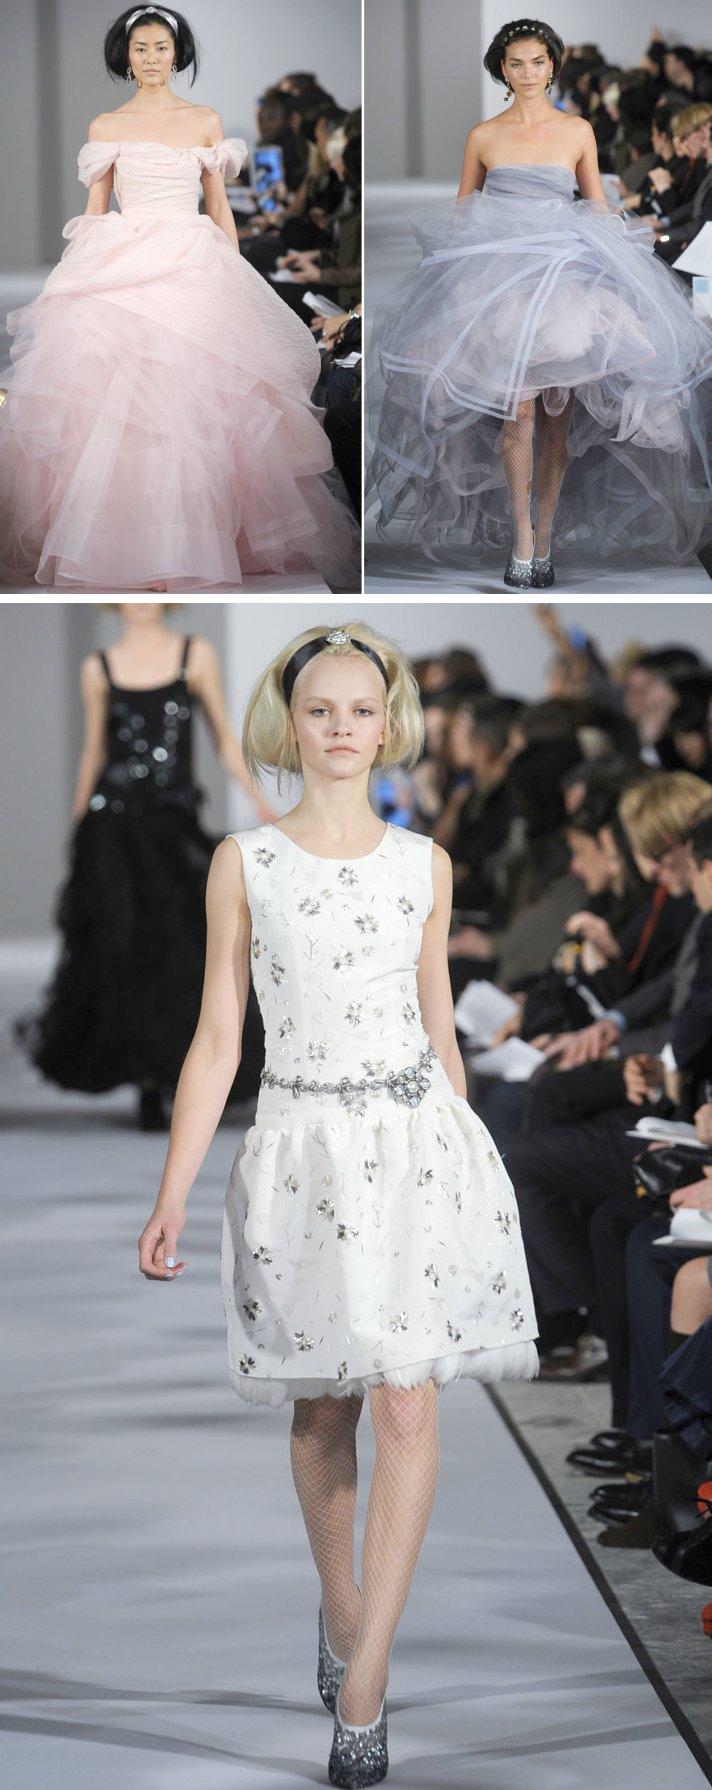 Oscar-de-la-renta-spring-2012-rtw-non-white-wedding-dresses-pastels.full